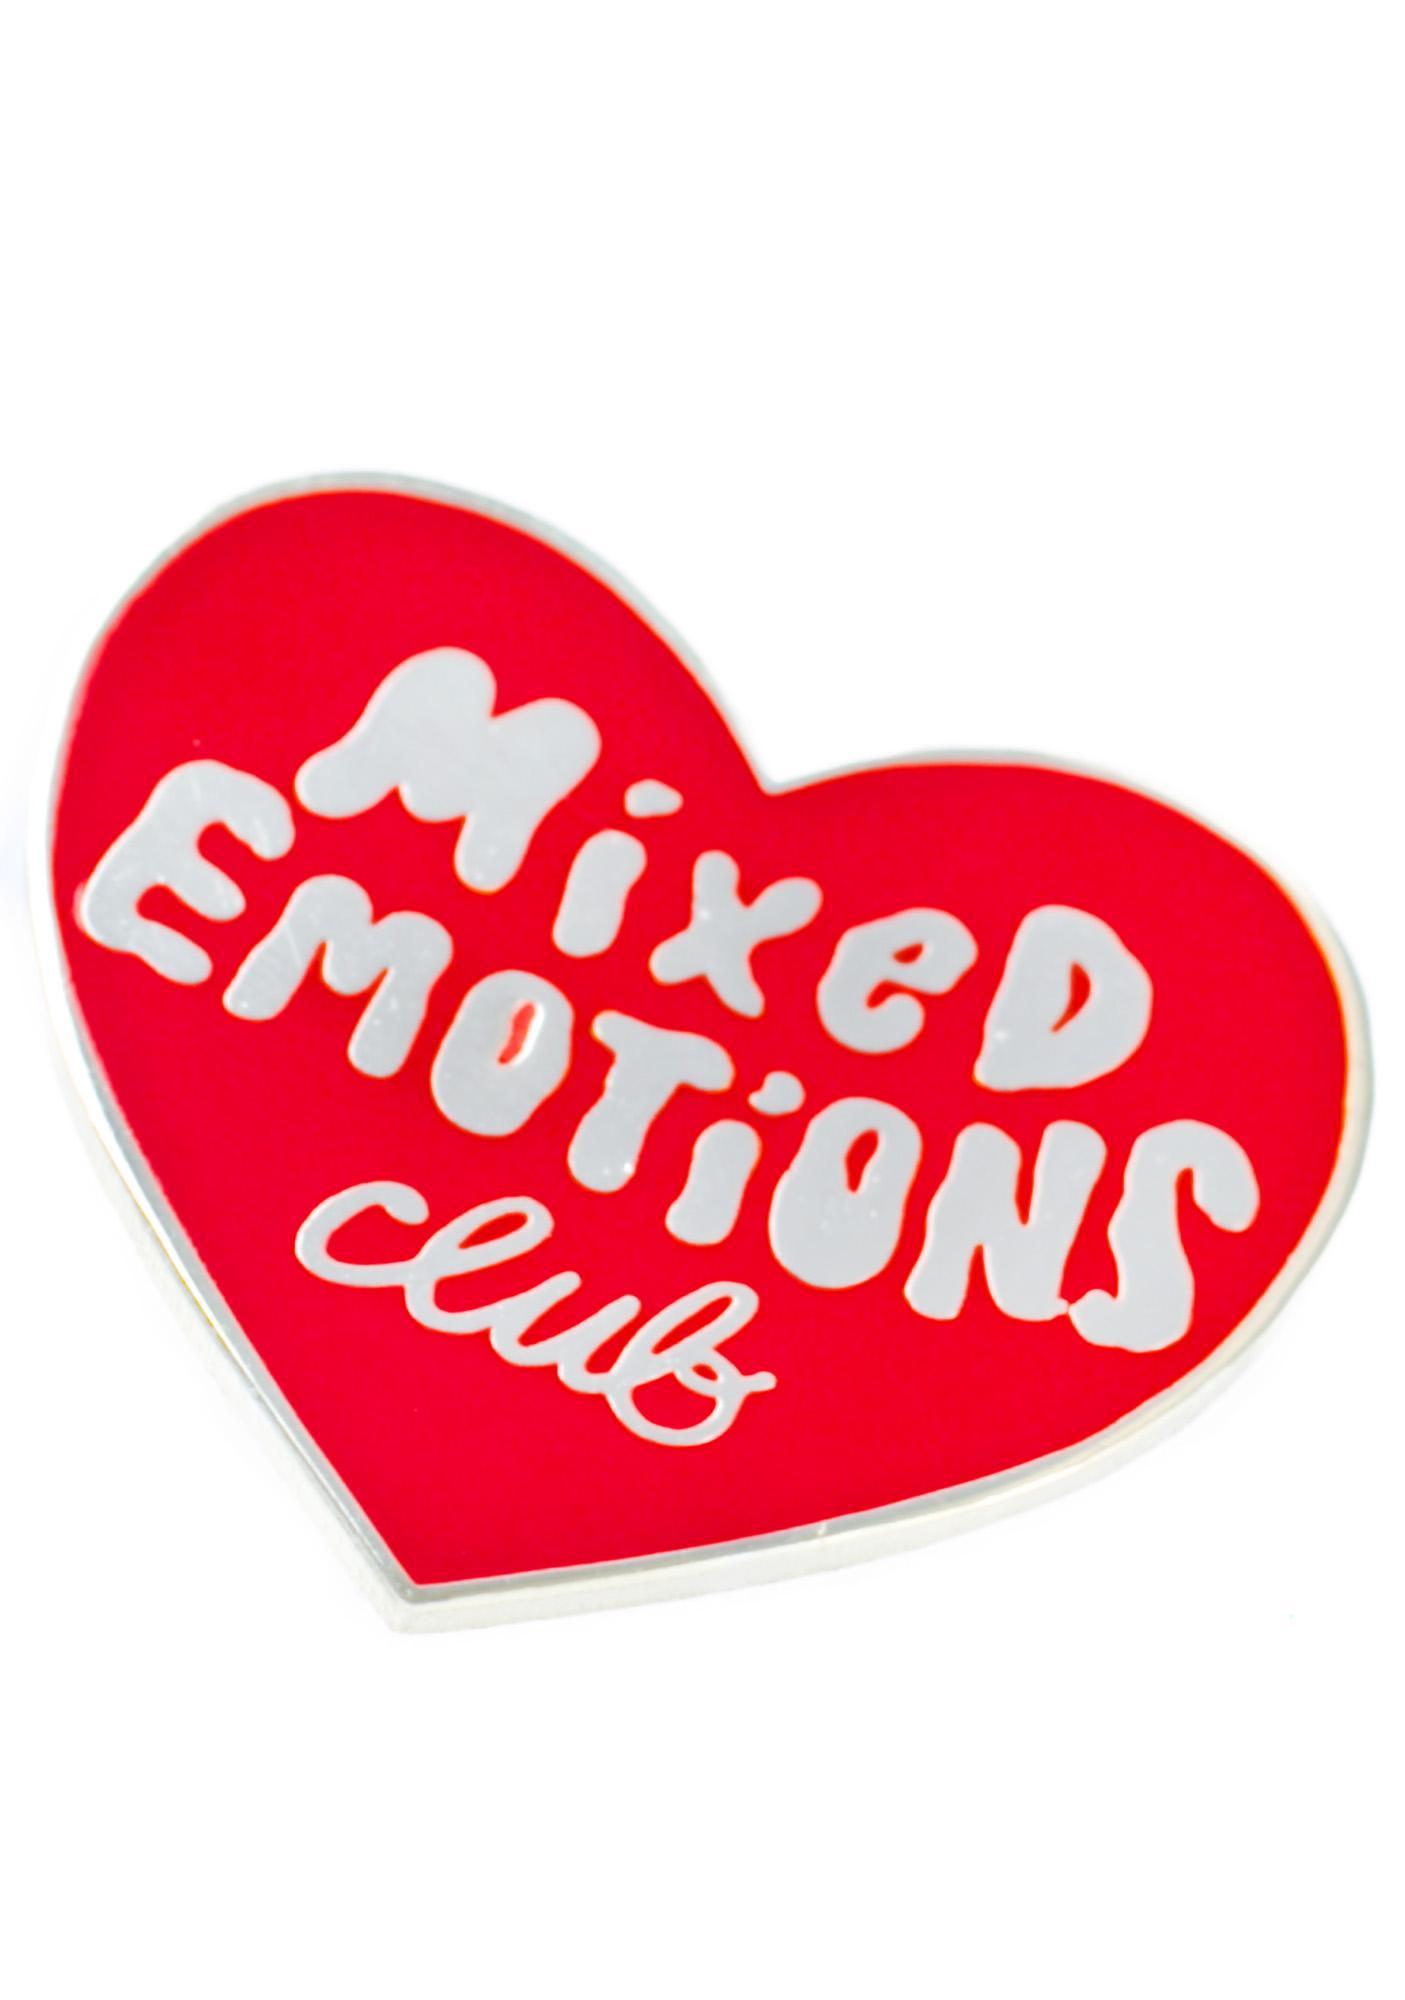 Tuesday Bassen Mixed Emotions Club Pin